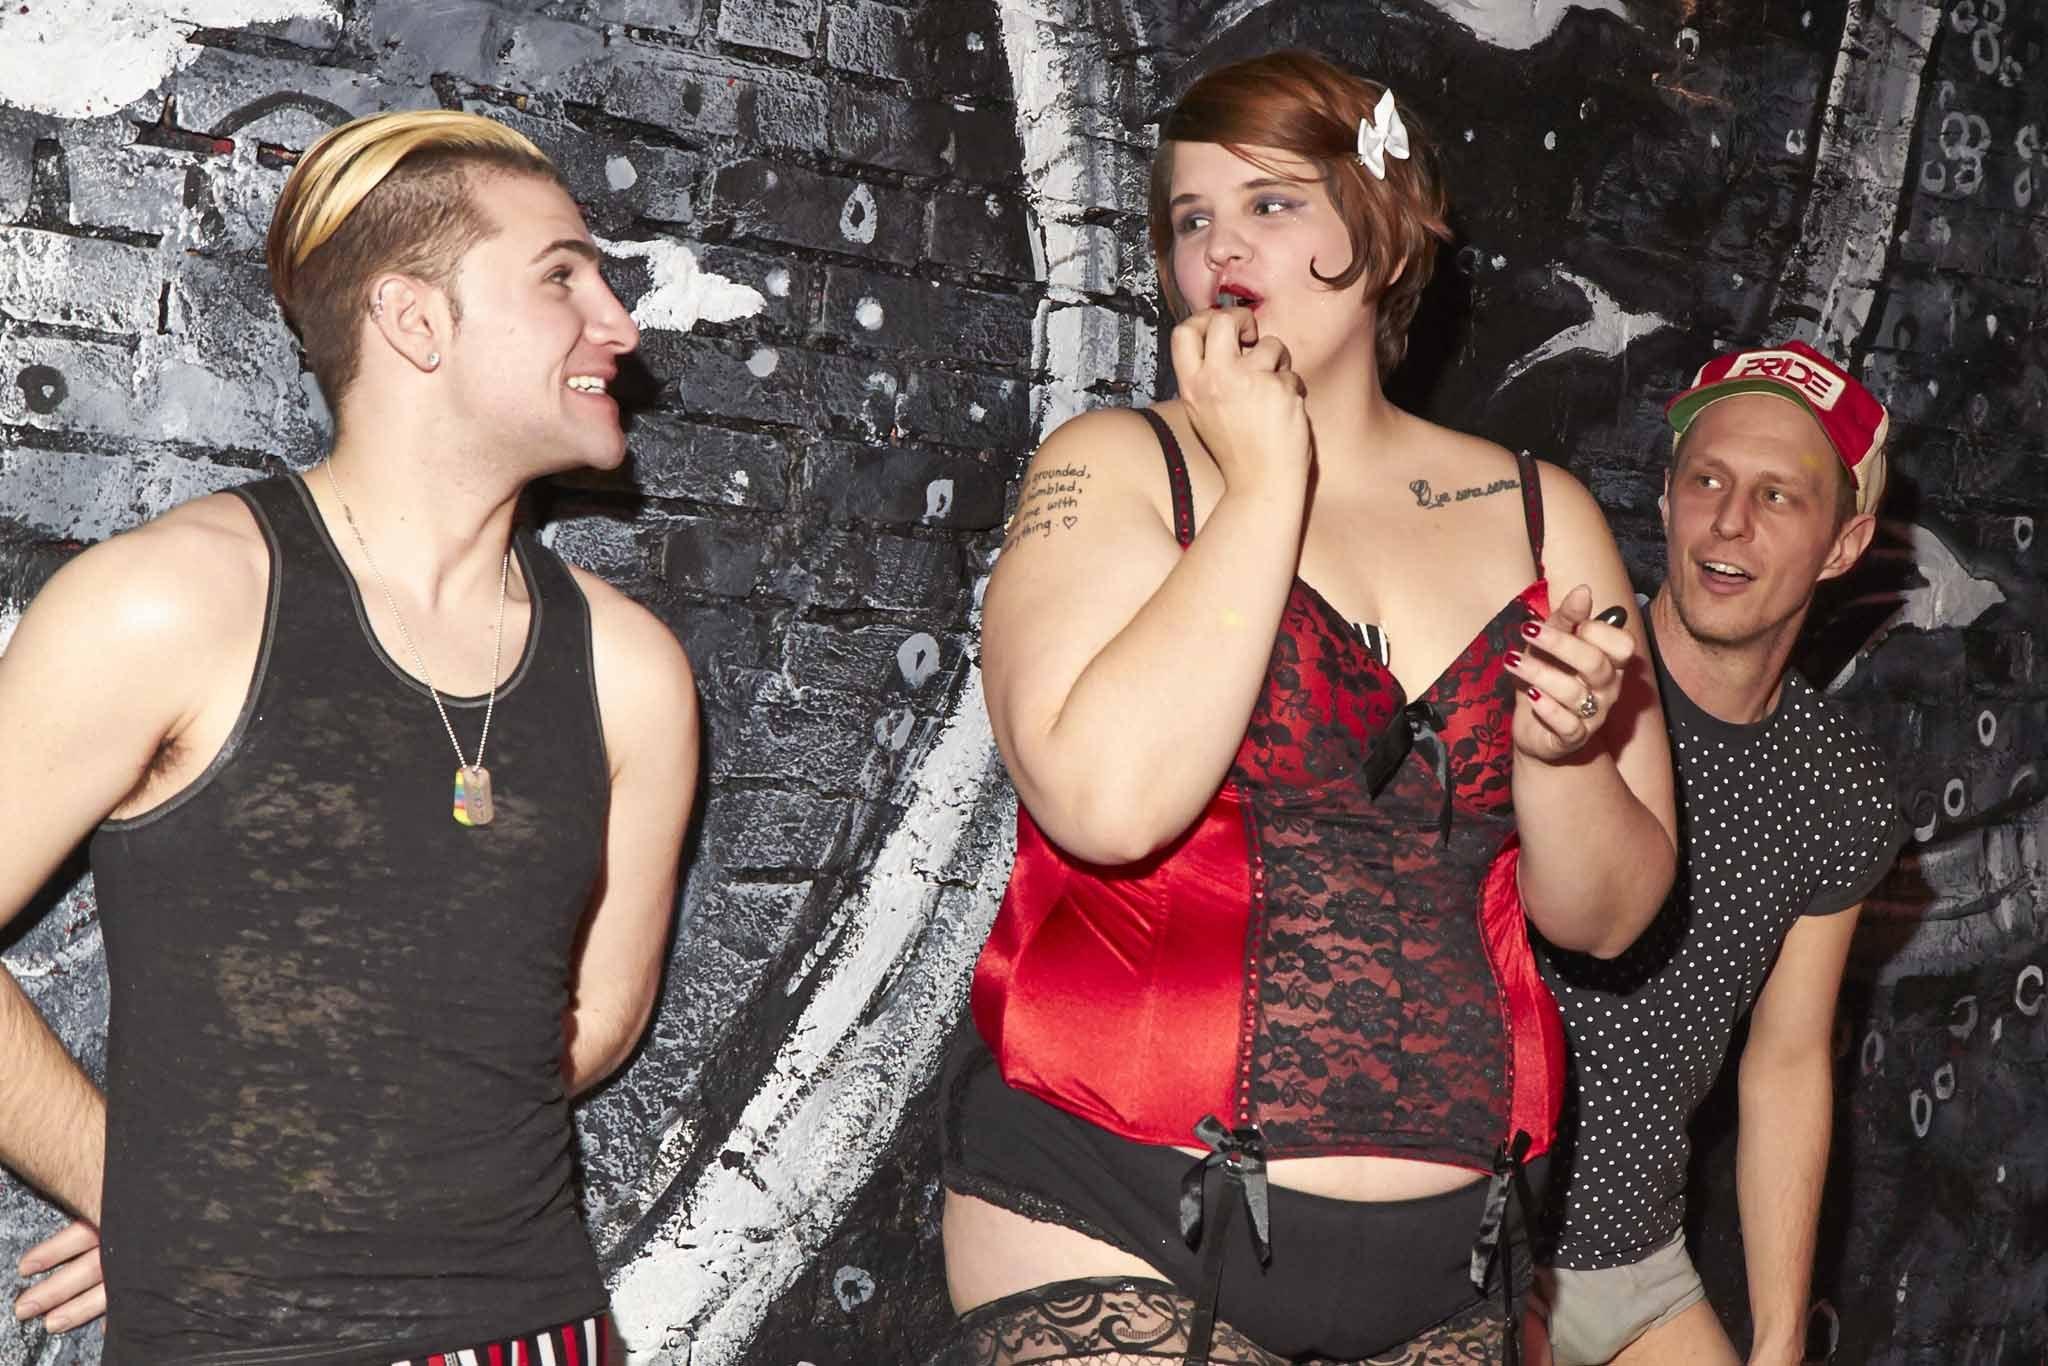 Photos: Rebel Cupcake: No Pants, No Problem (NSFW)